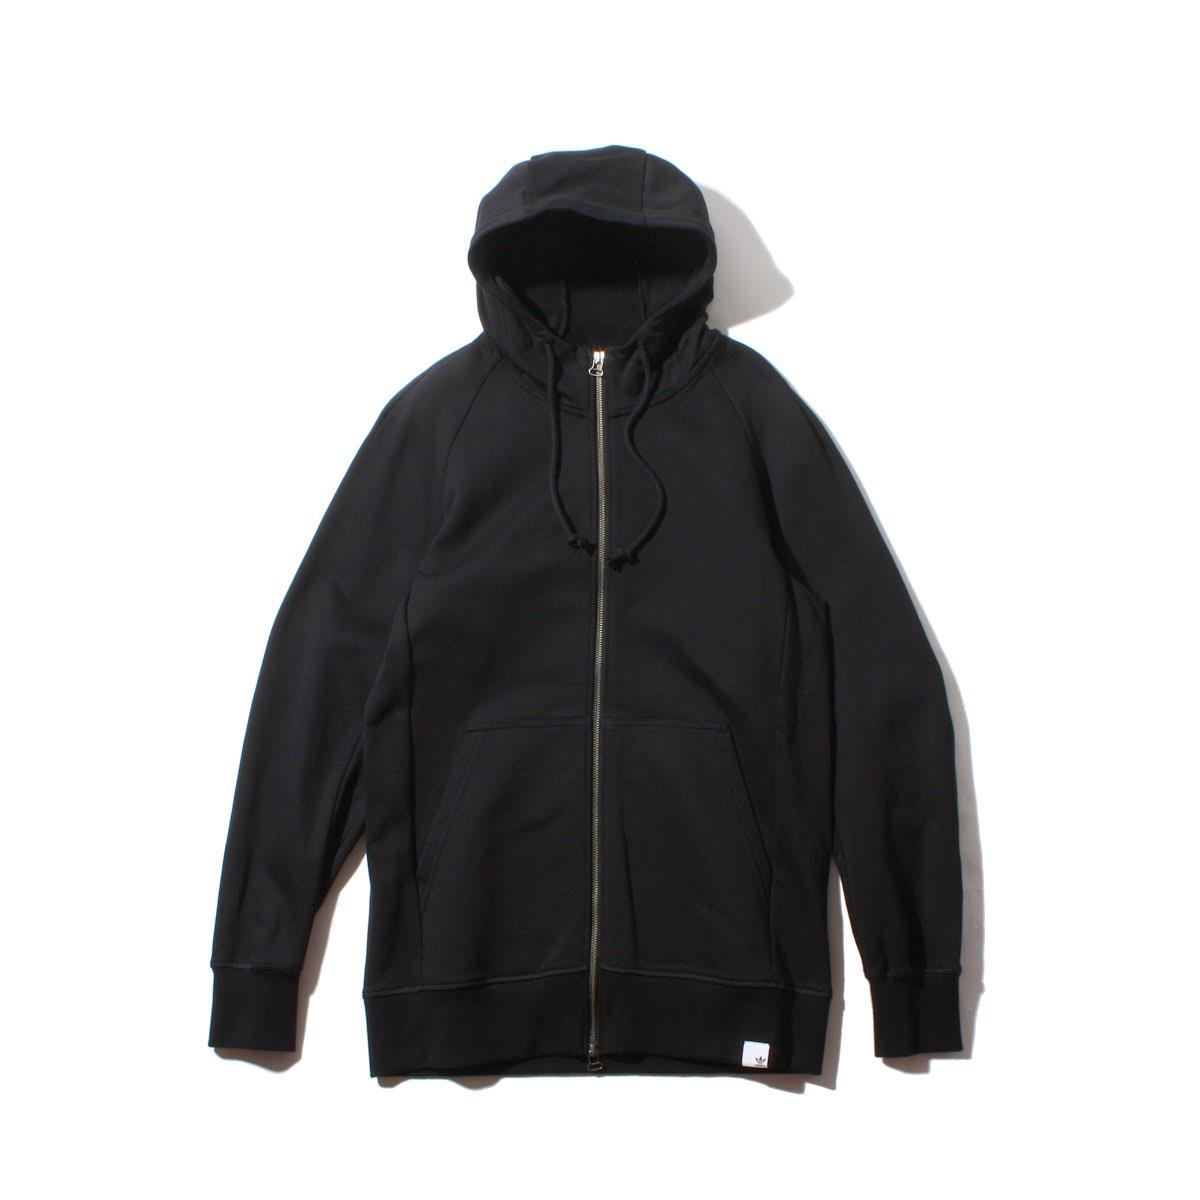 adidas Originals XBYO FULLZIP HOODIE(アディダス オリジナルス XBYO フルジップ フーディー)Black【メンズ パーカー】18SS-I